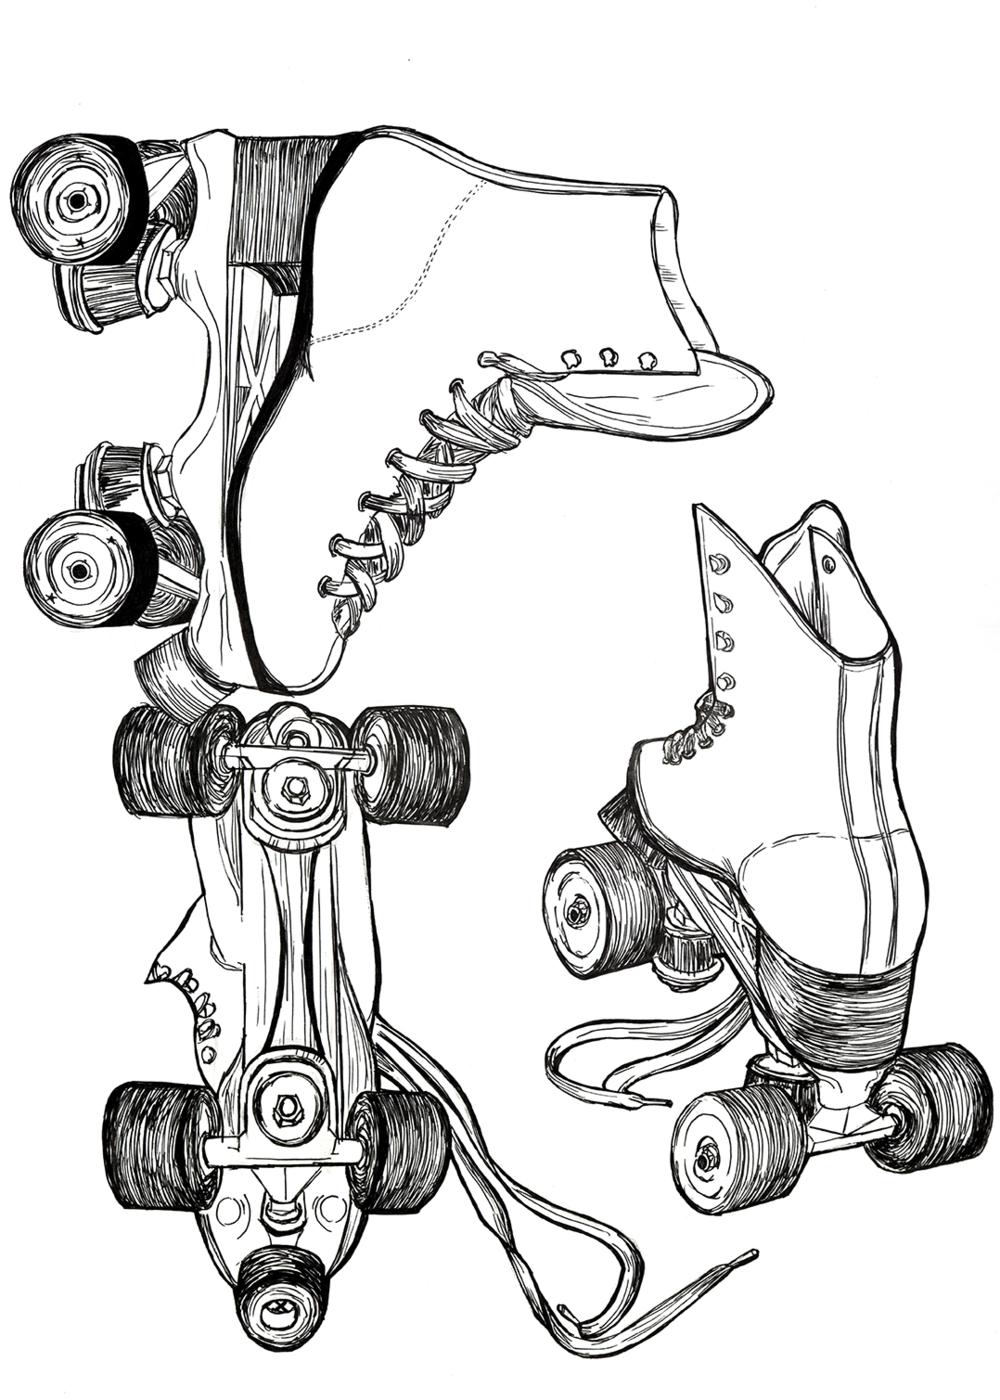 rant-skate-4.png